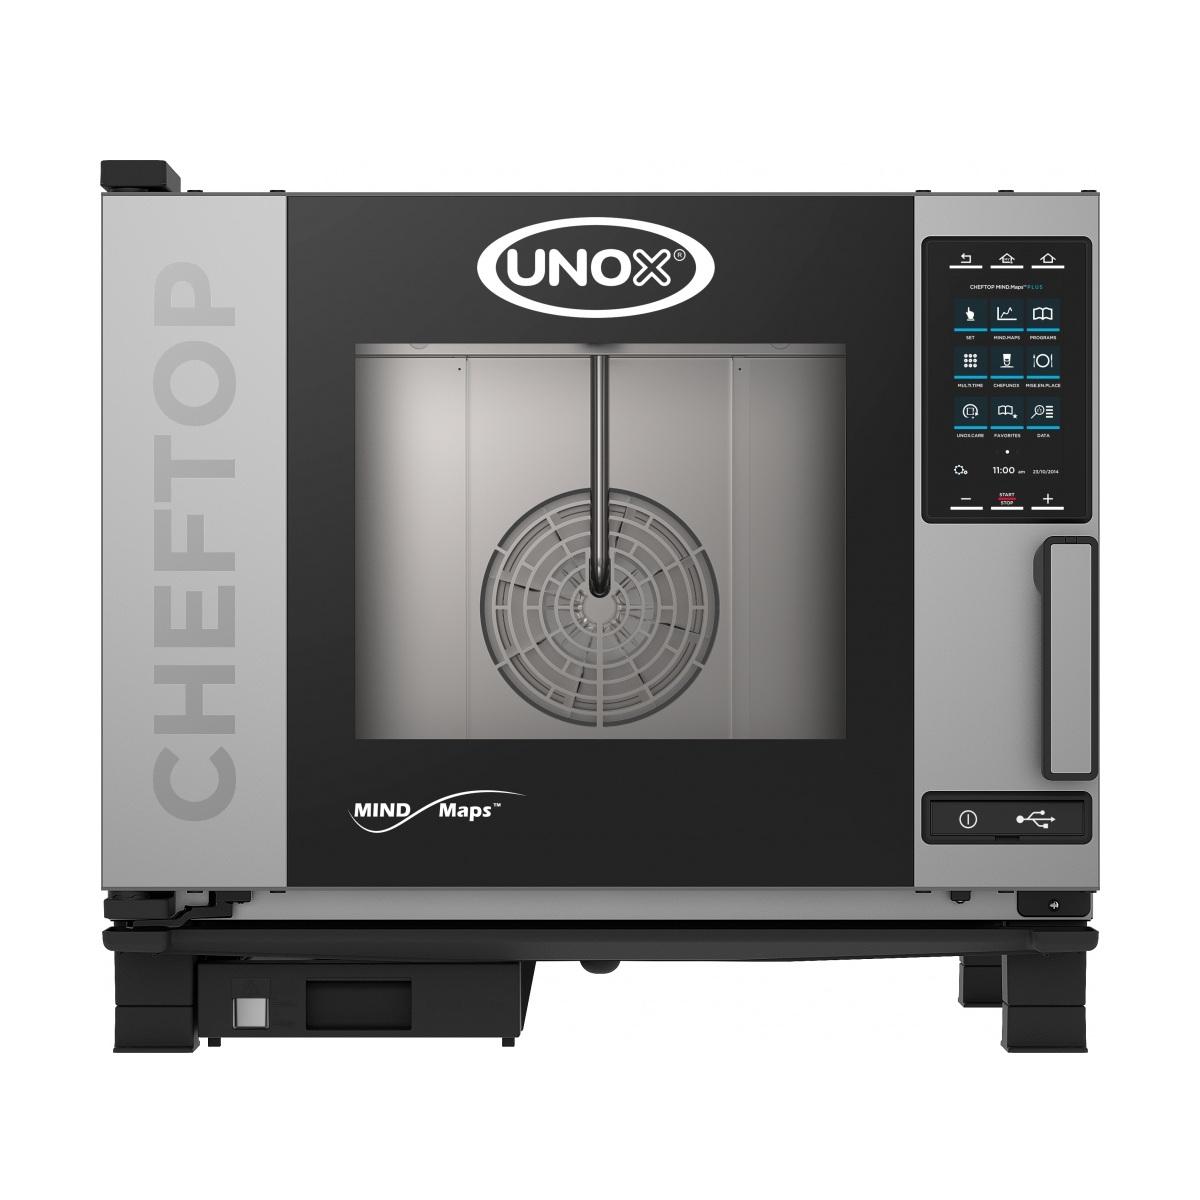 UNOX XEVC-0511-EPR-SP